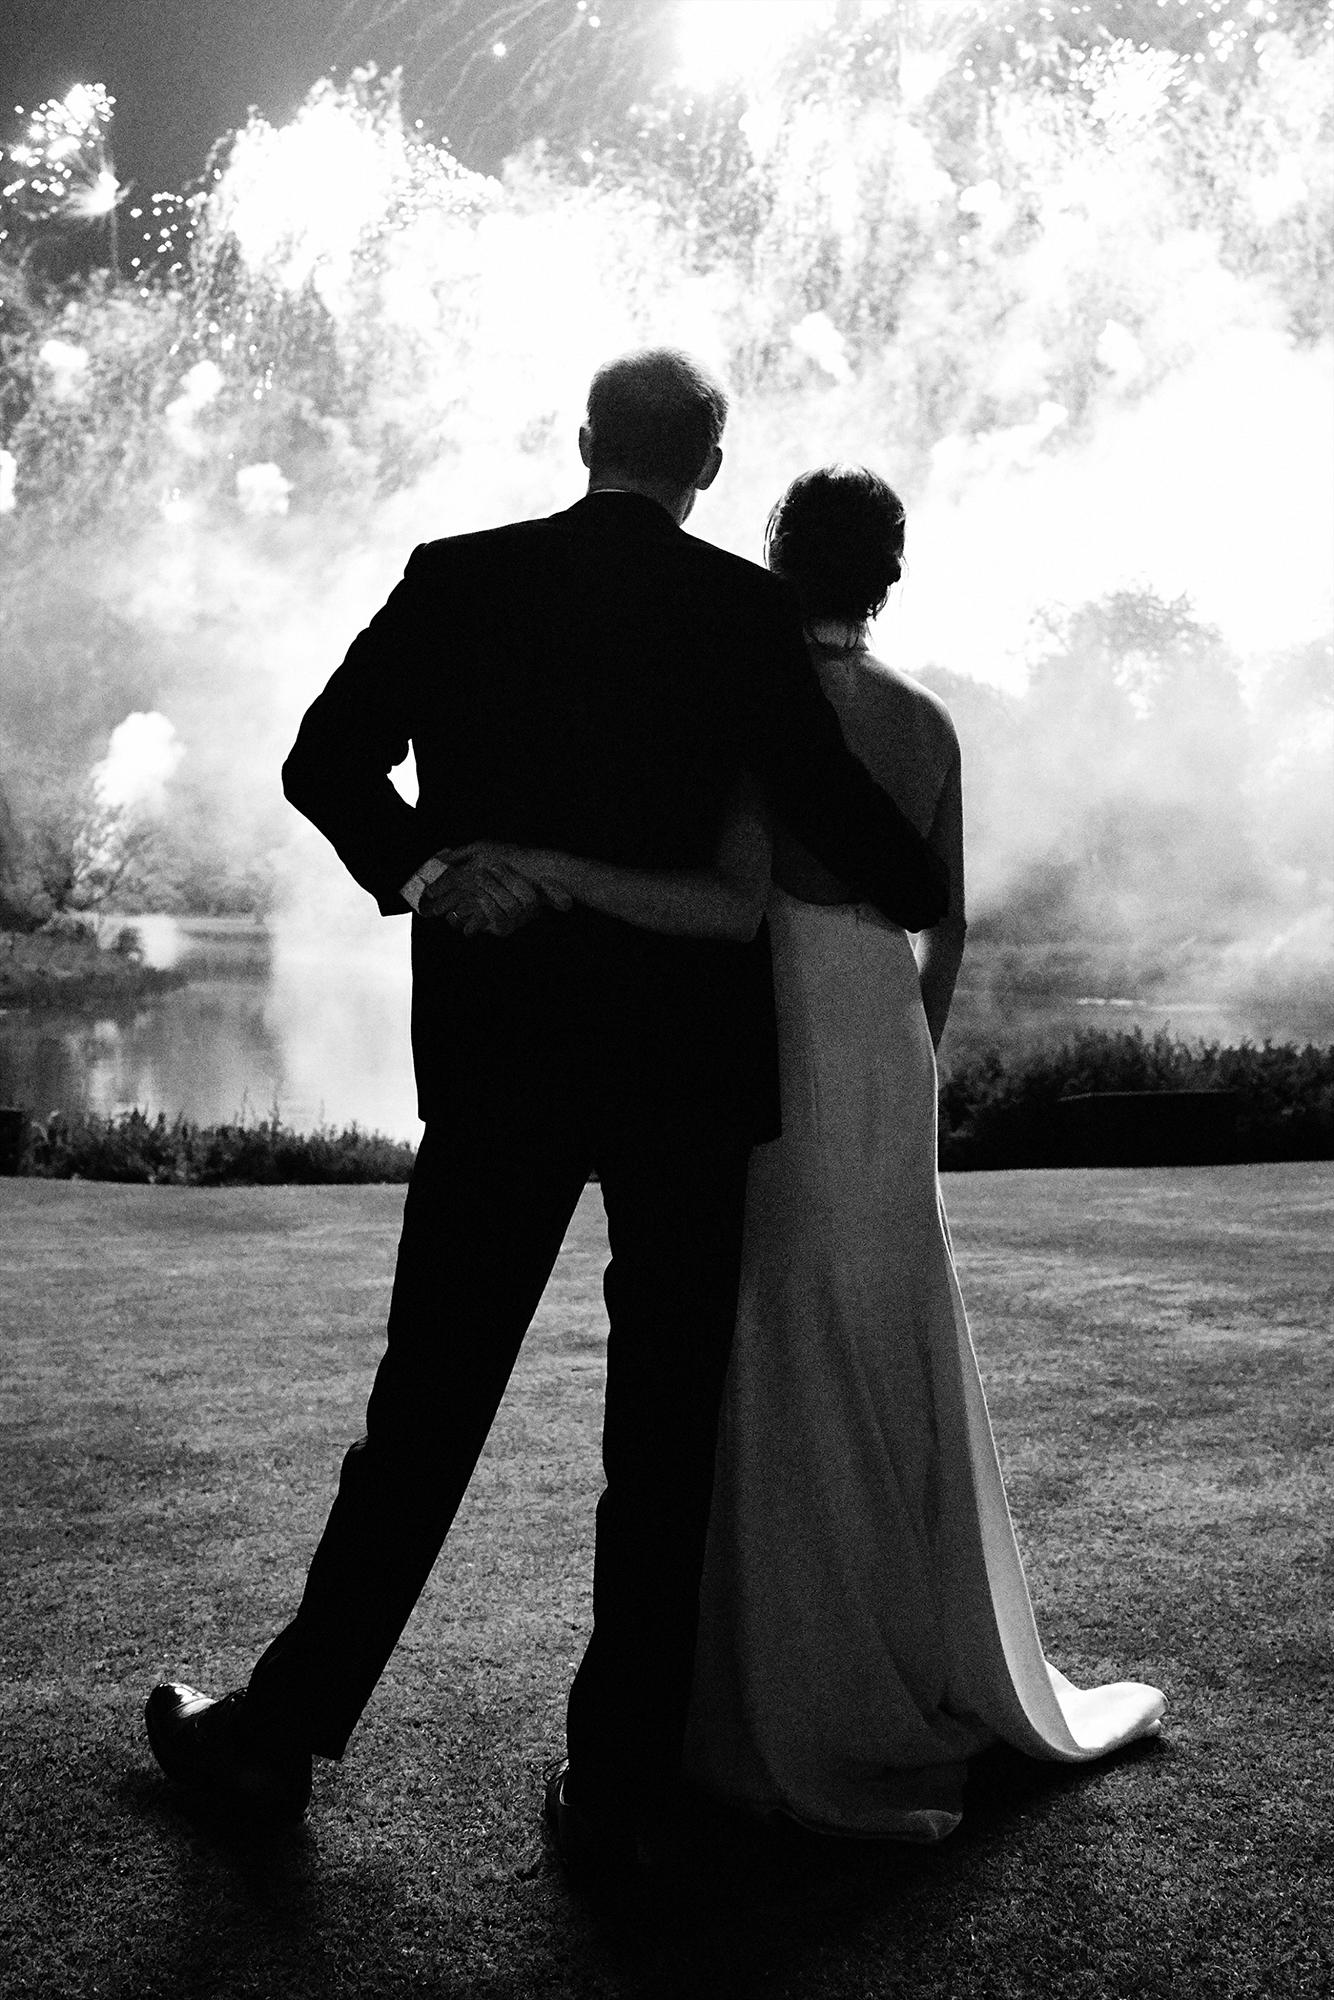 duchess-meghan-prince-harry-holiday-card-2018 - Prince Harry and Duchess Meghan